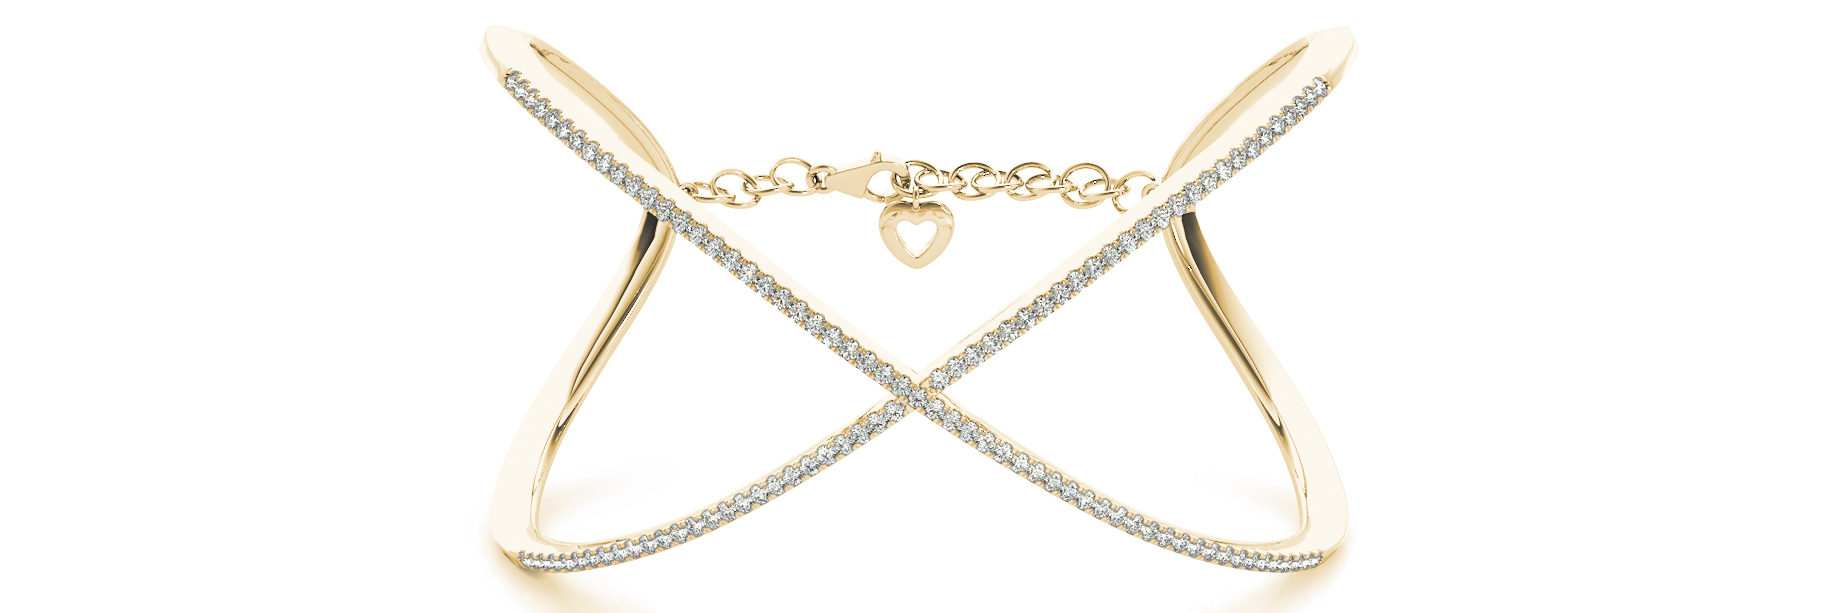 Yellow Gold Cross Wrist Open Cuff Style Diamond Bracelet